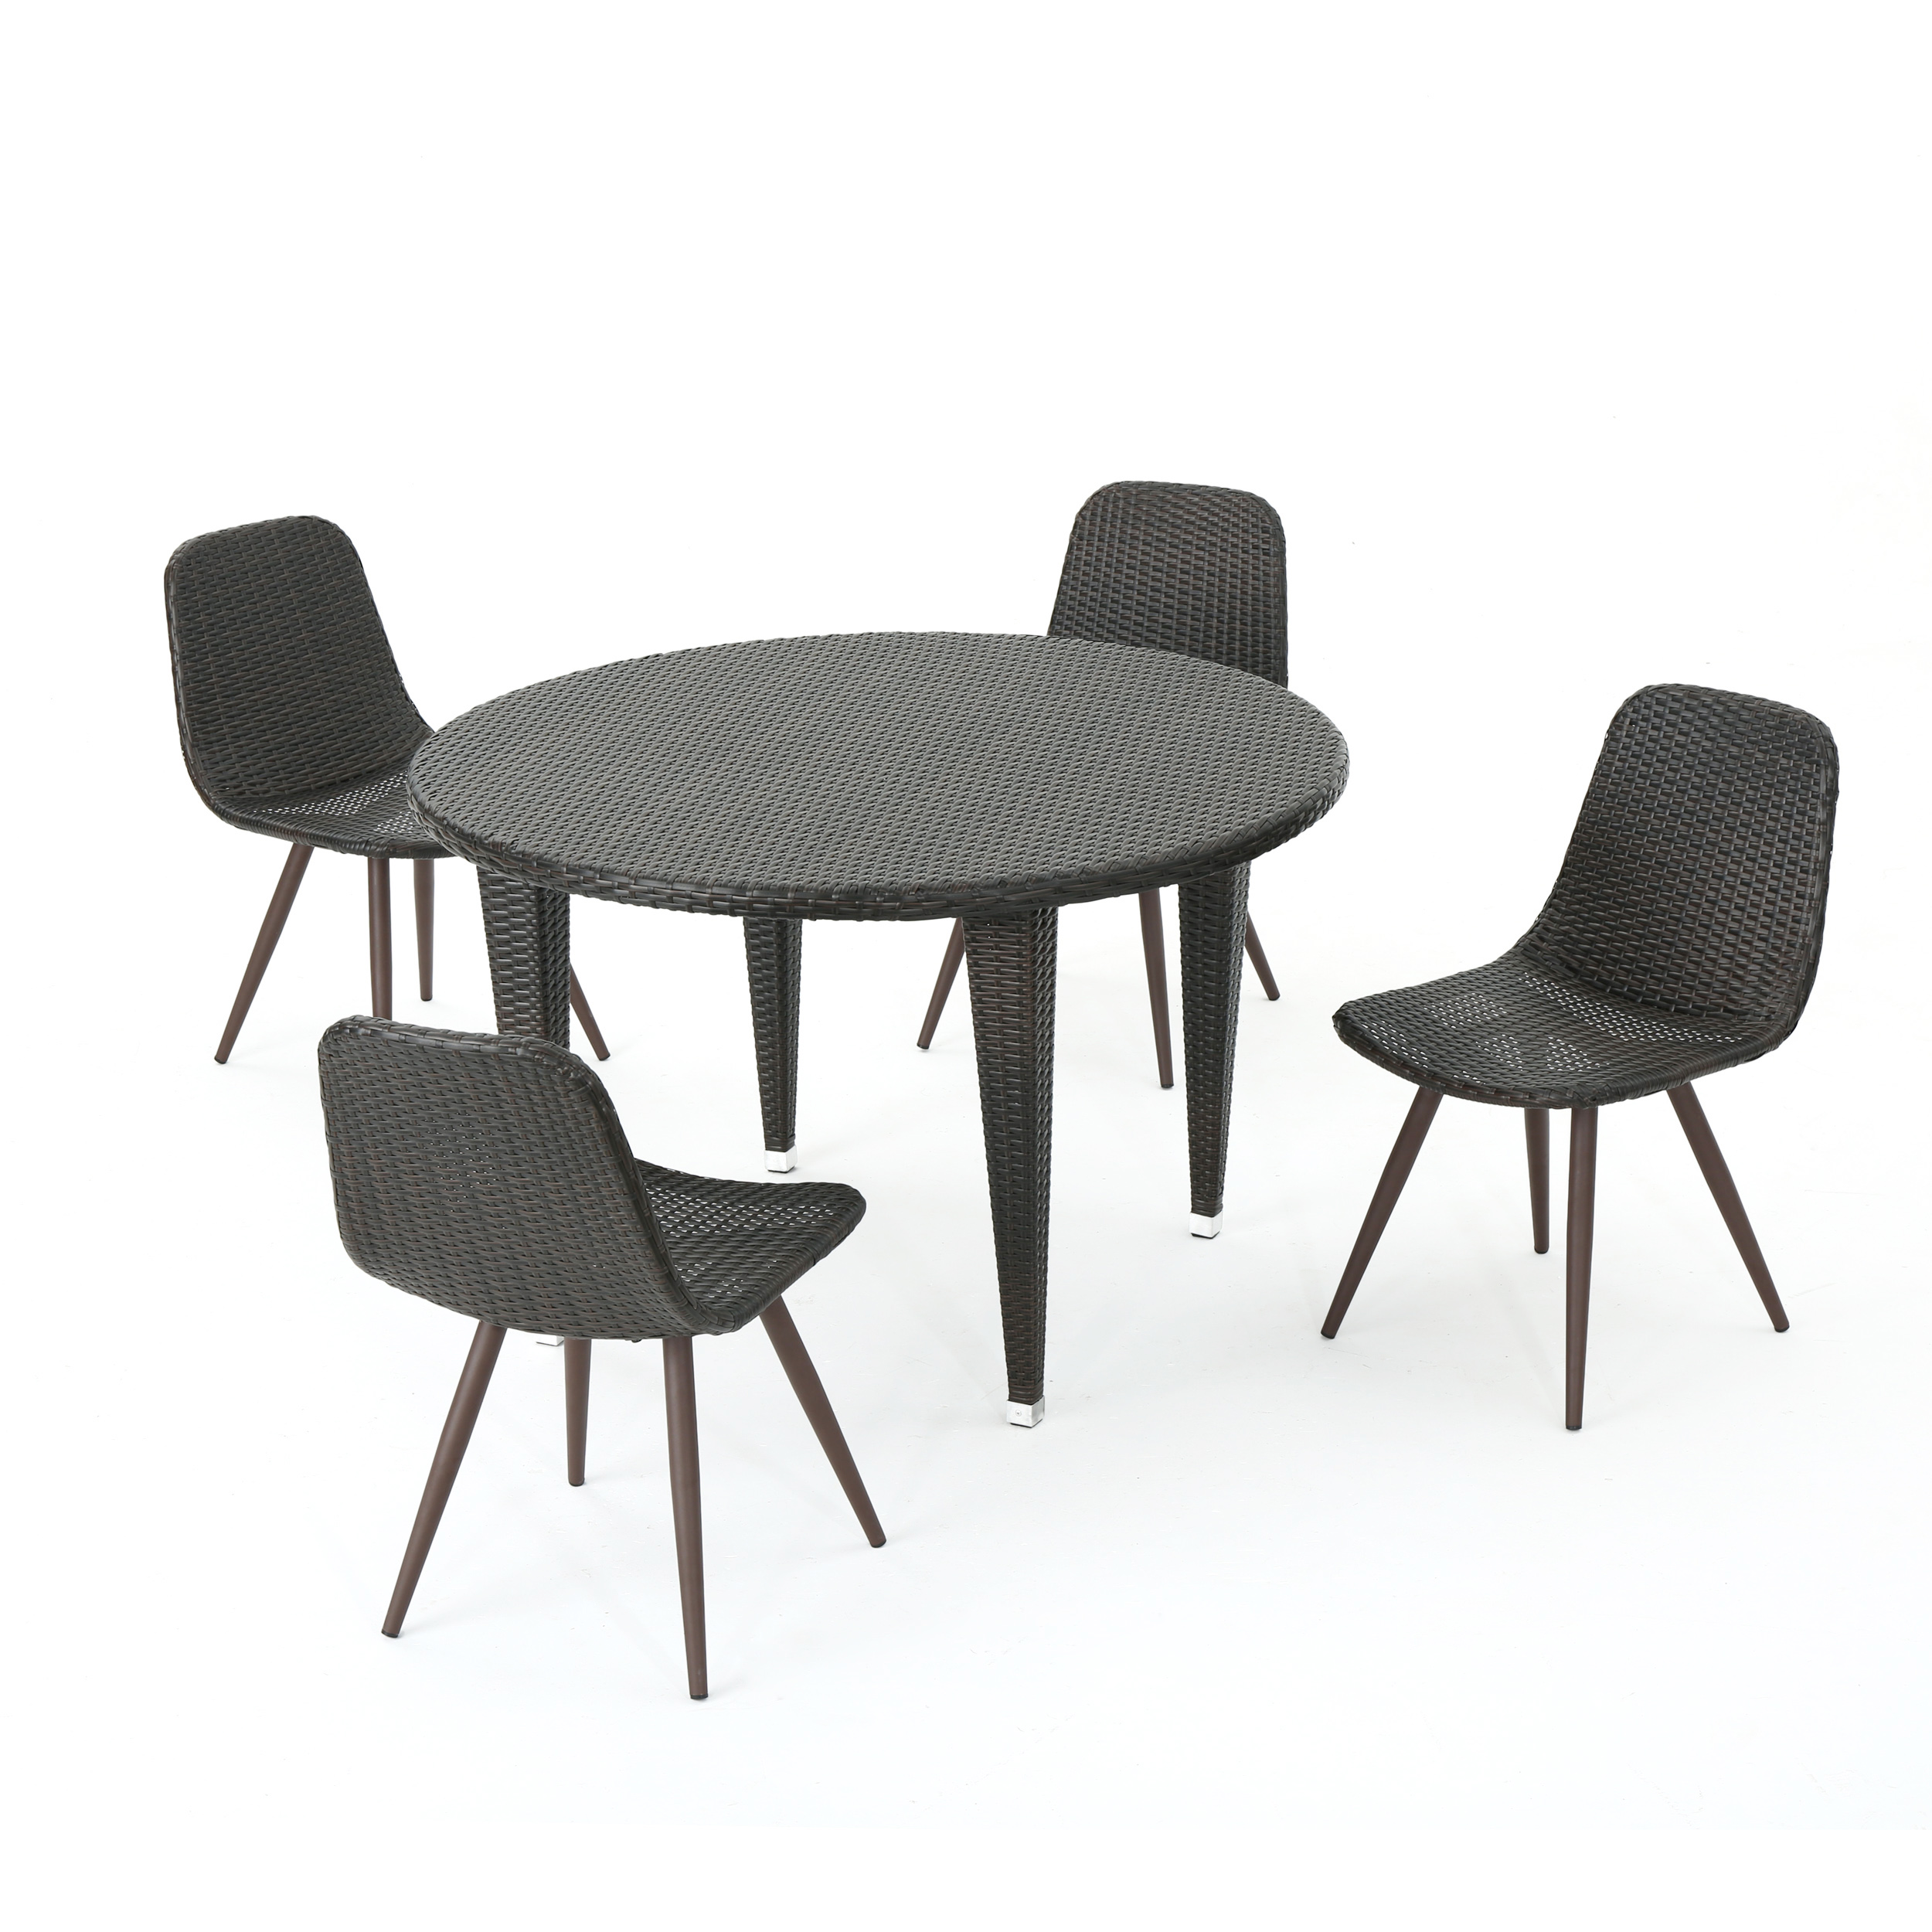 Gamba Outdoor 5 Piece Wicker Circular Dining Set, Multibrown